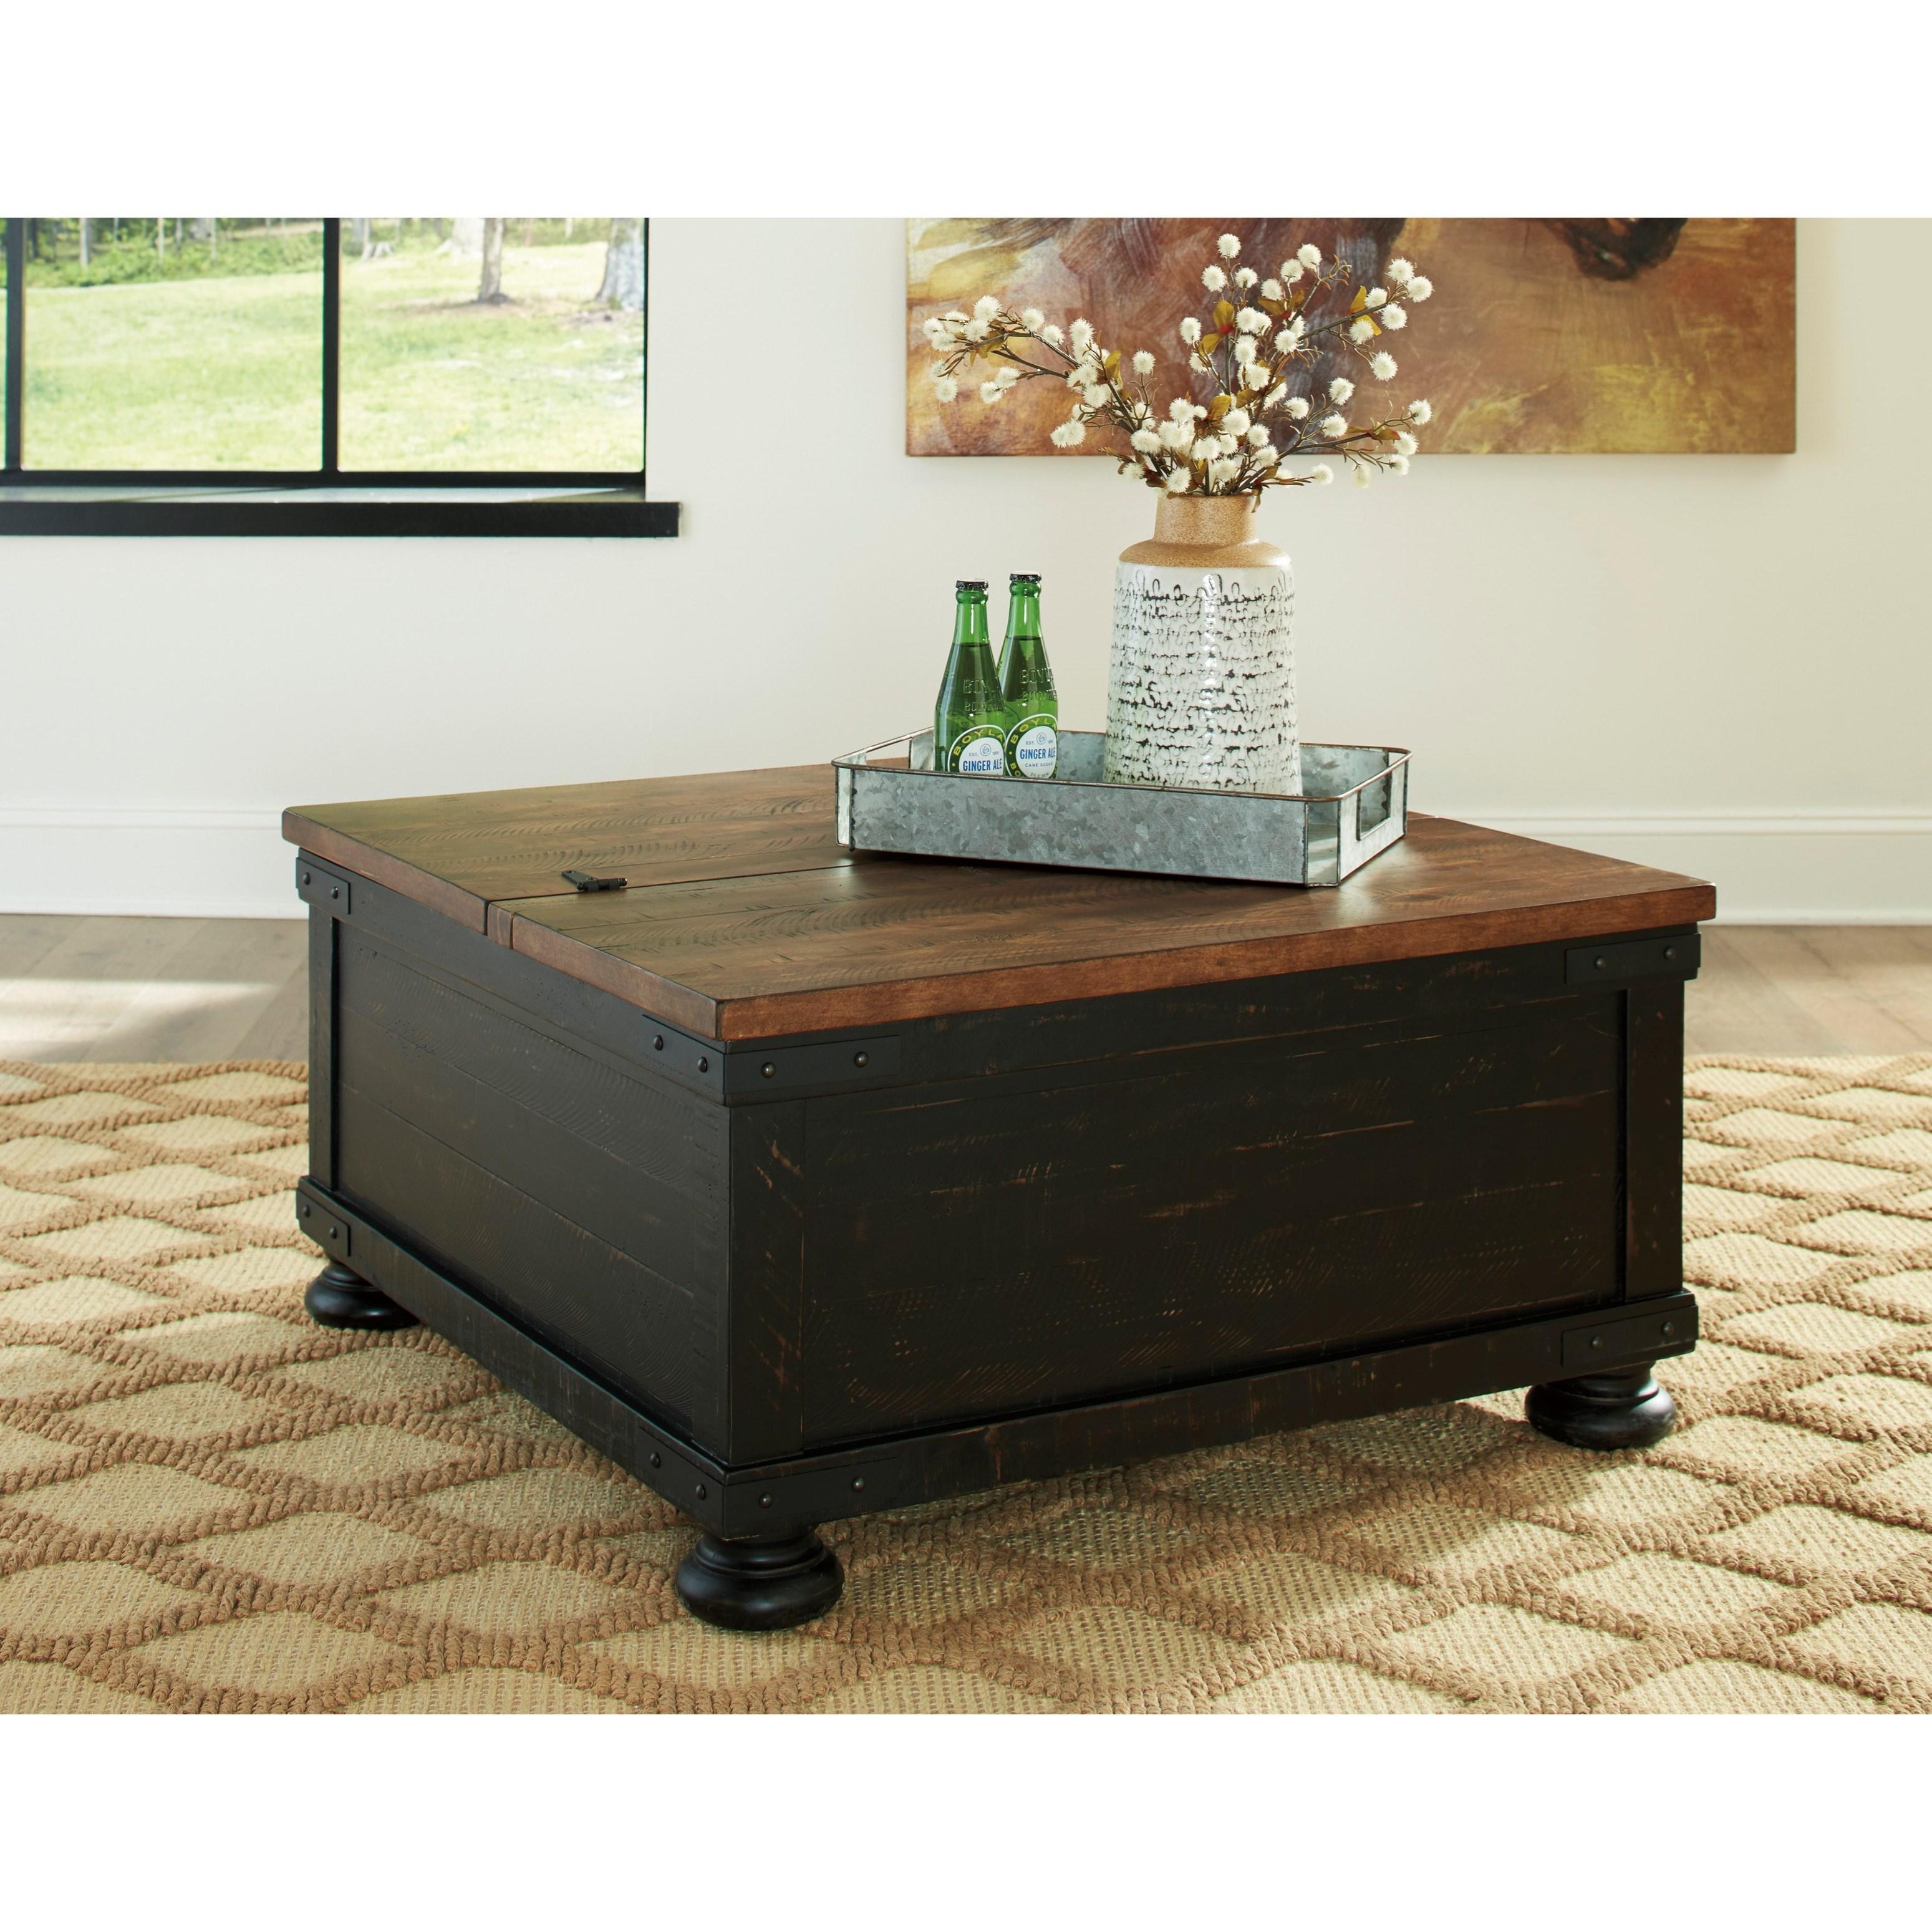 Storage Coffee Table Ashley: Signature Design By Ashley Valebeck Two-Tone Finish